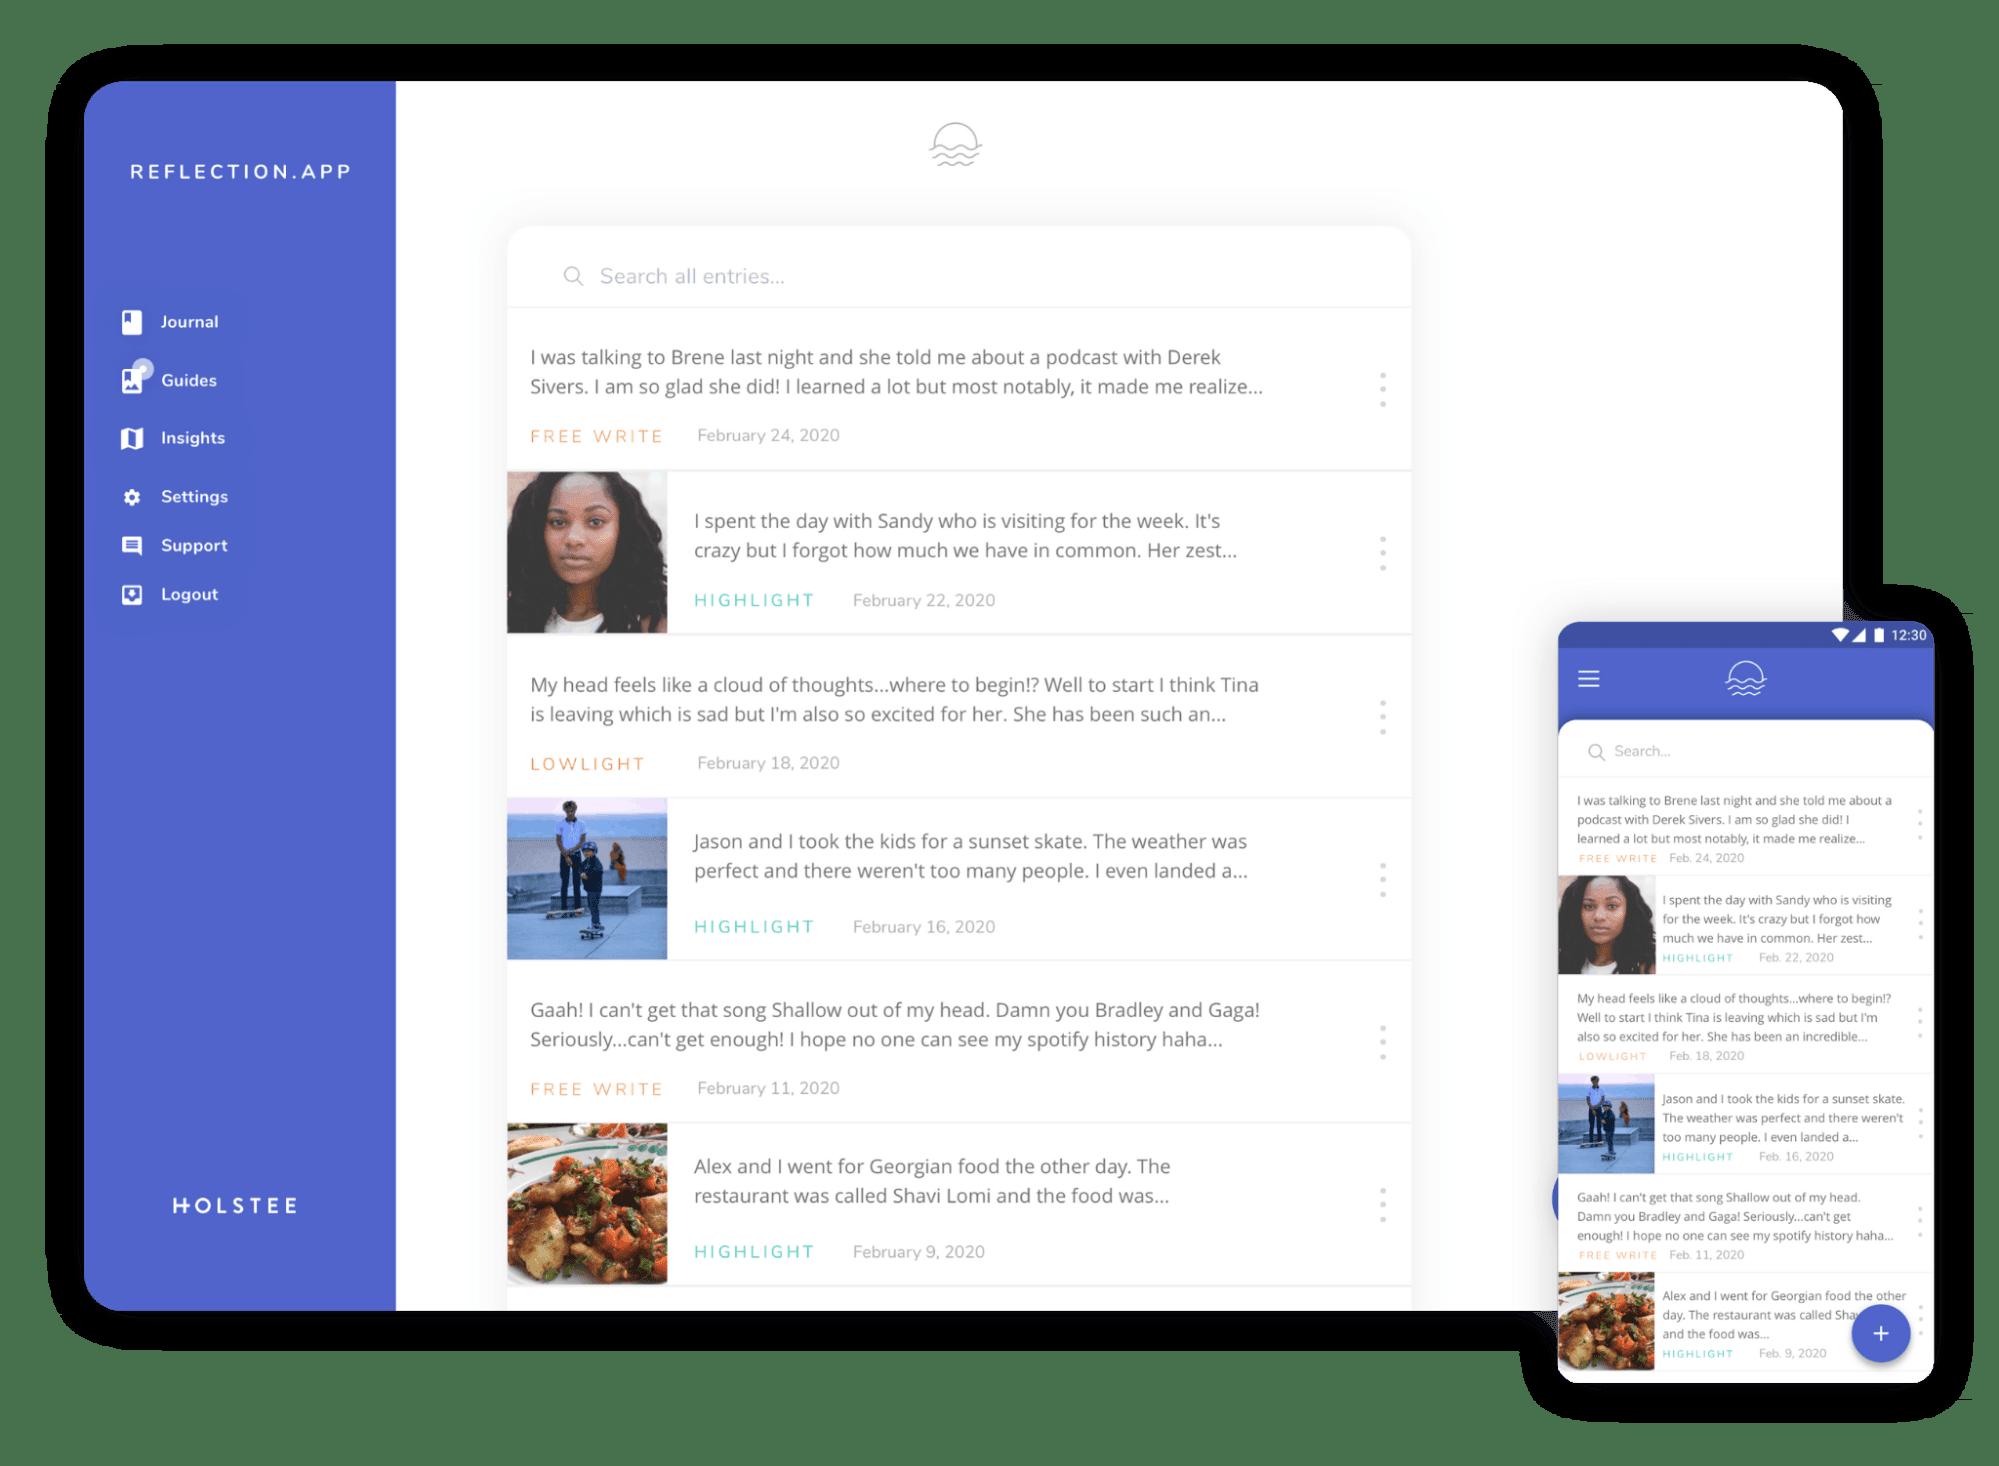 Screenshot of the journaling app Reflection.App